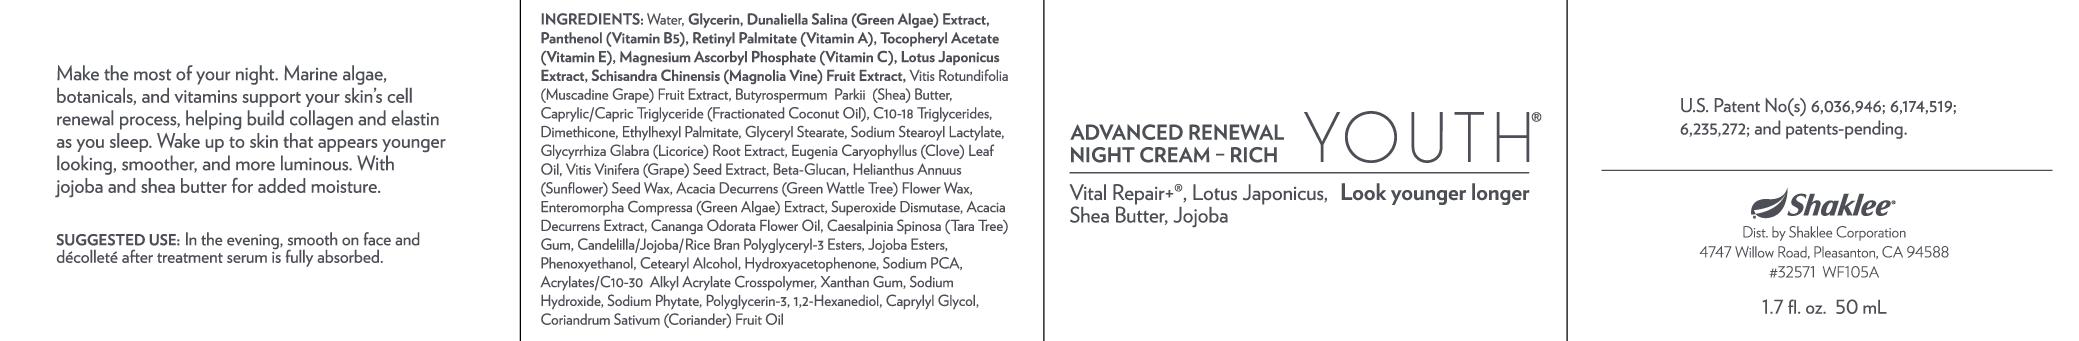 YOUTH Advance Renewal Night Cream-Rich (32571)